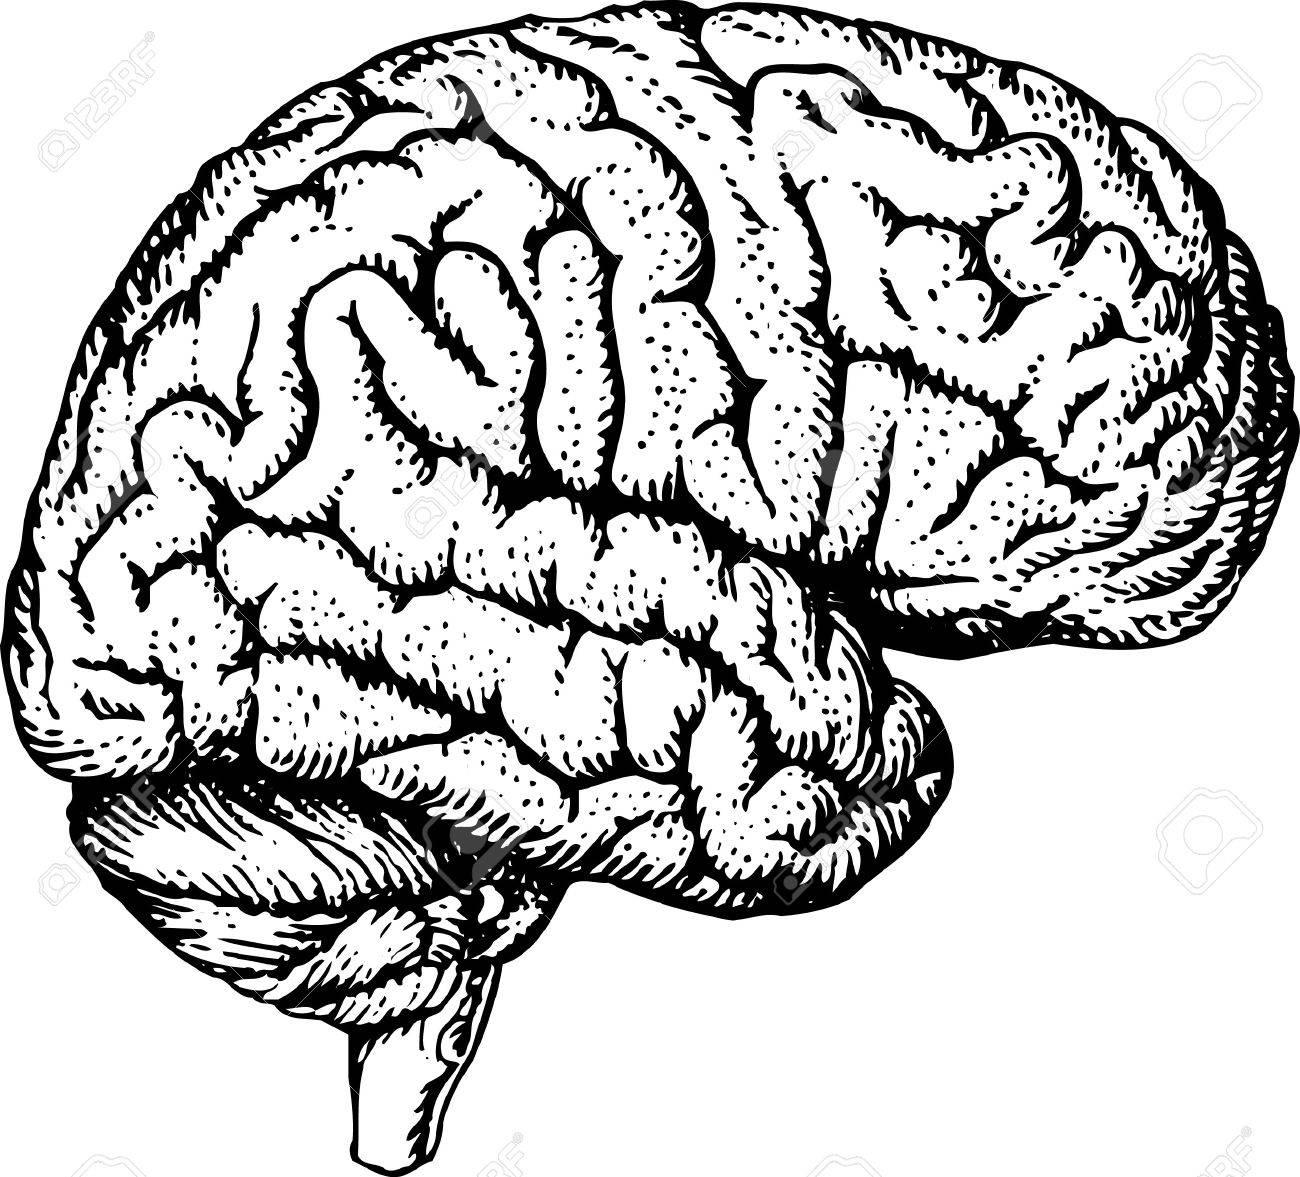 1300x1177 Human Brain Royalty Free Cliparts, Vectors, And Stock Illustration